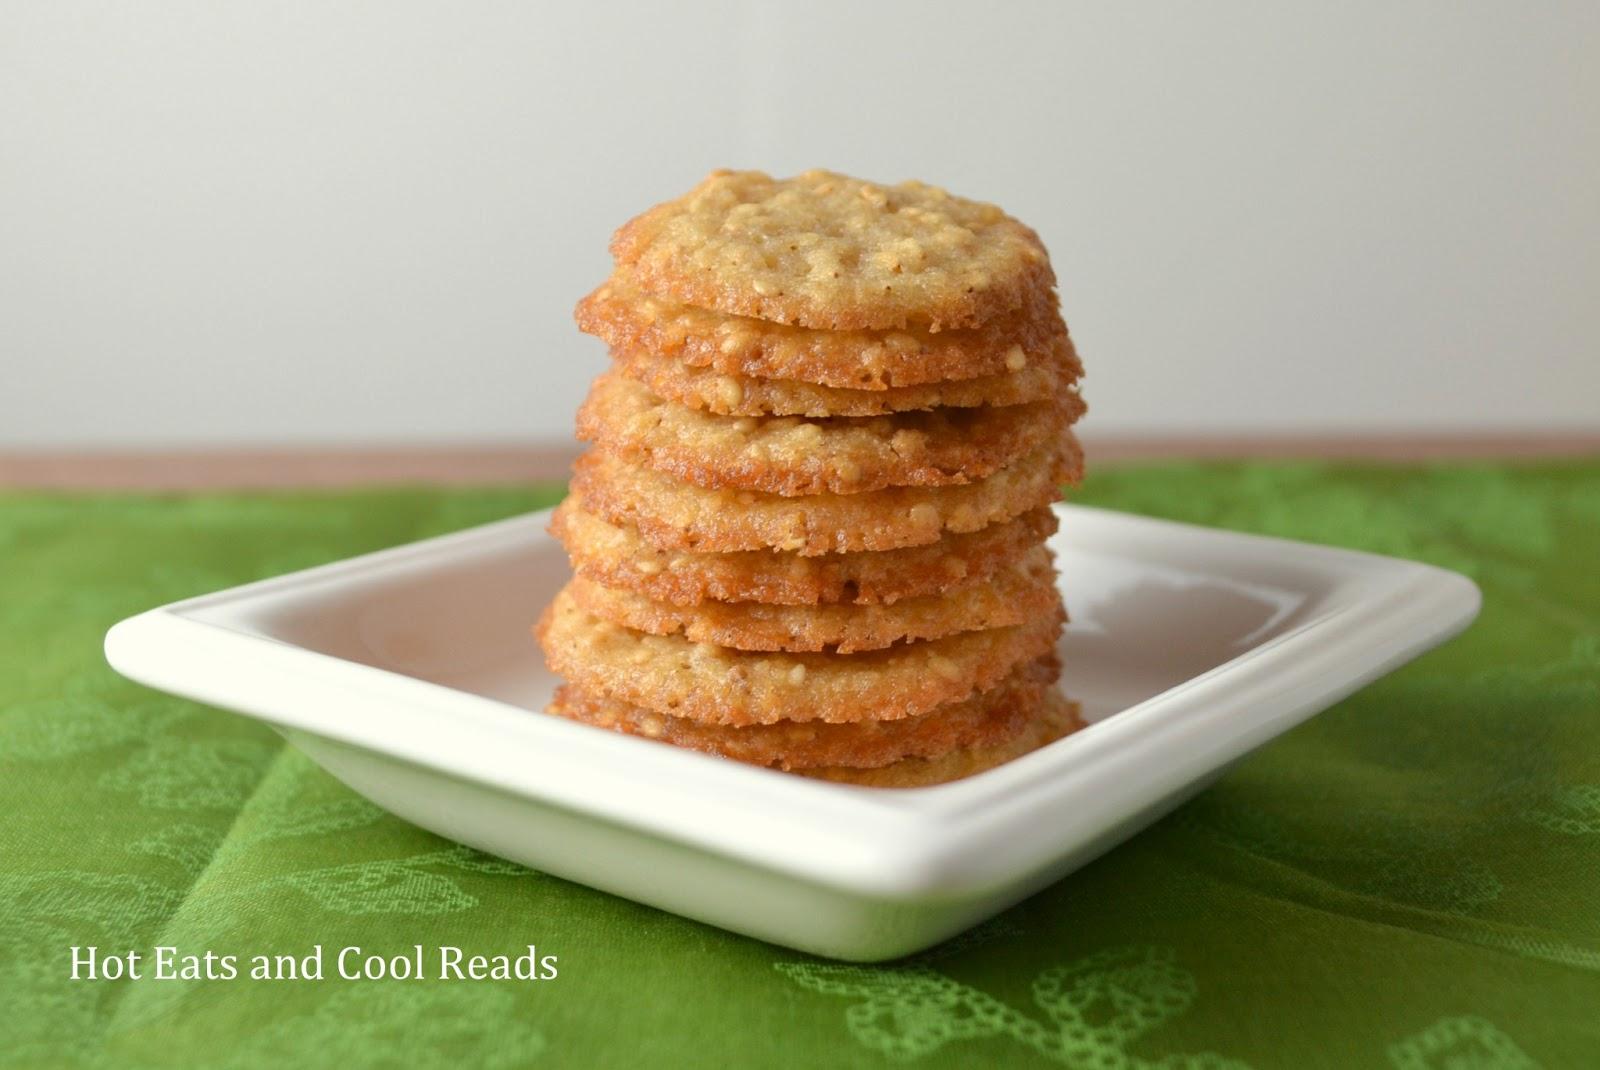 Benne Wafers aka Sesame Seed Cookies Recipe